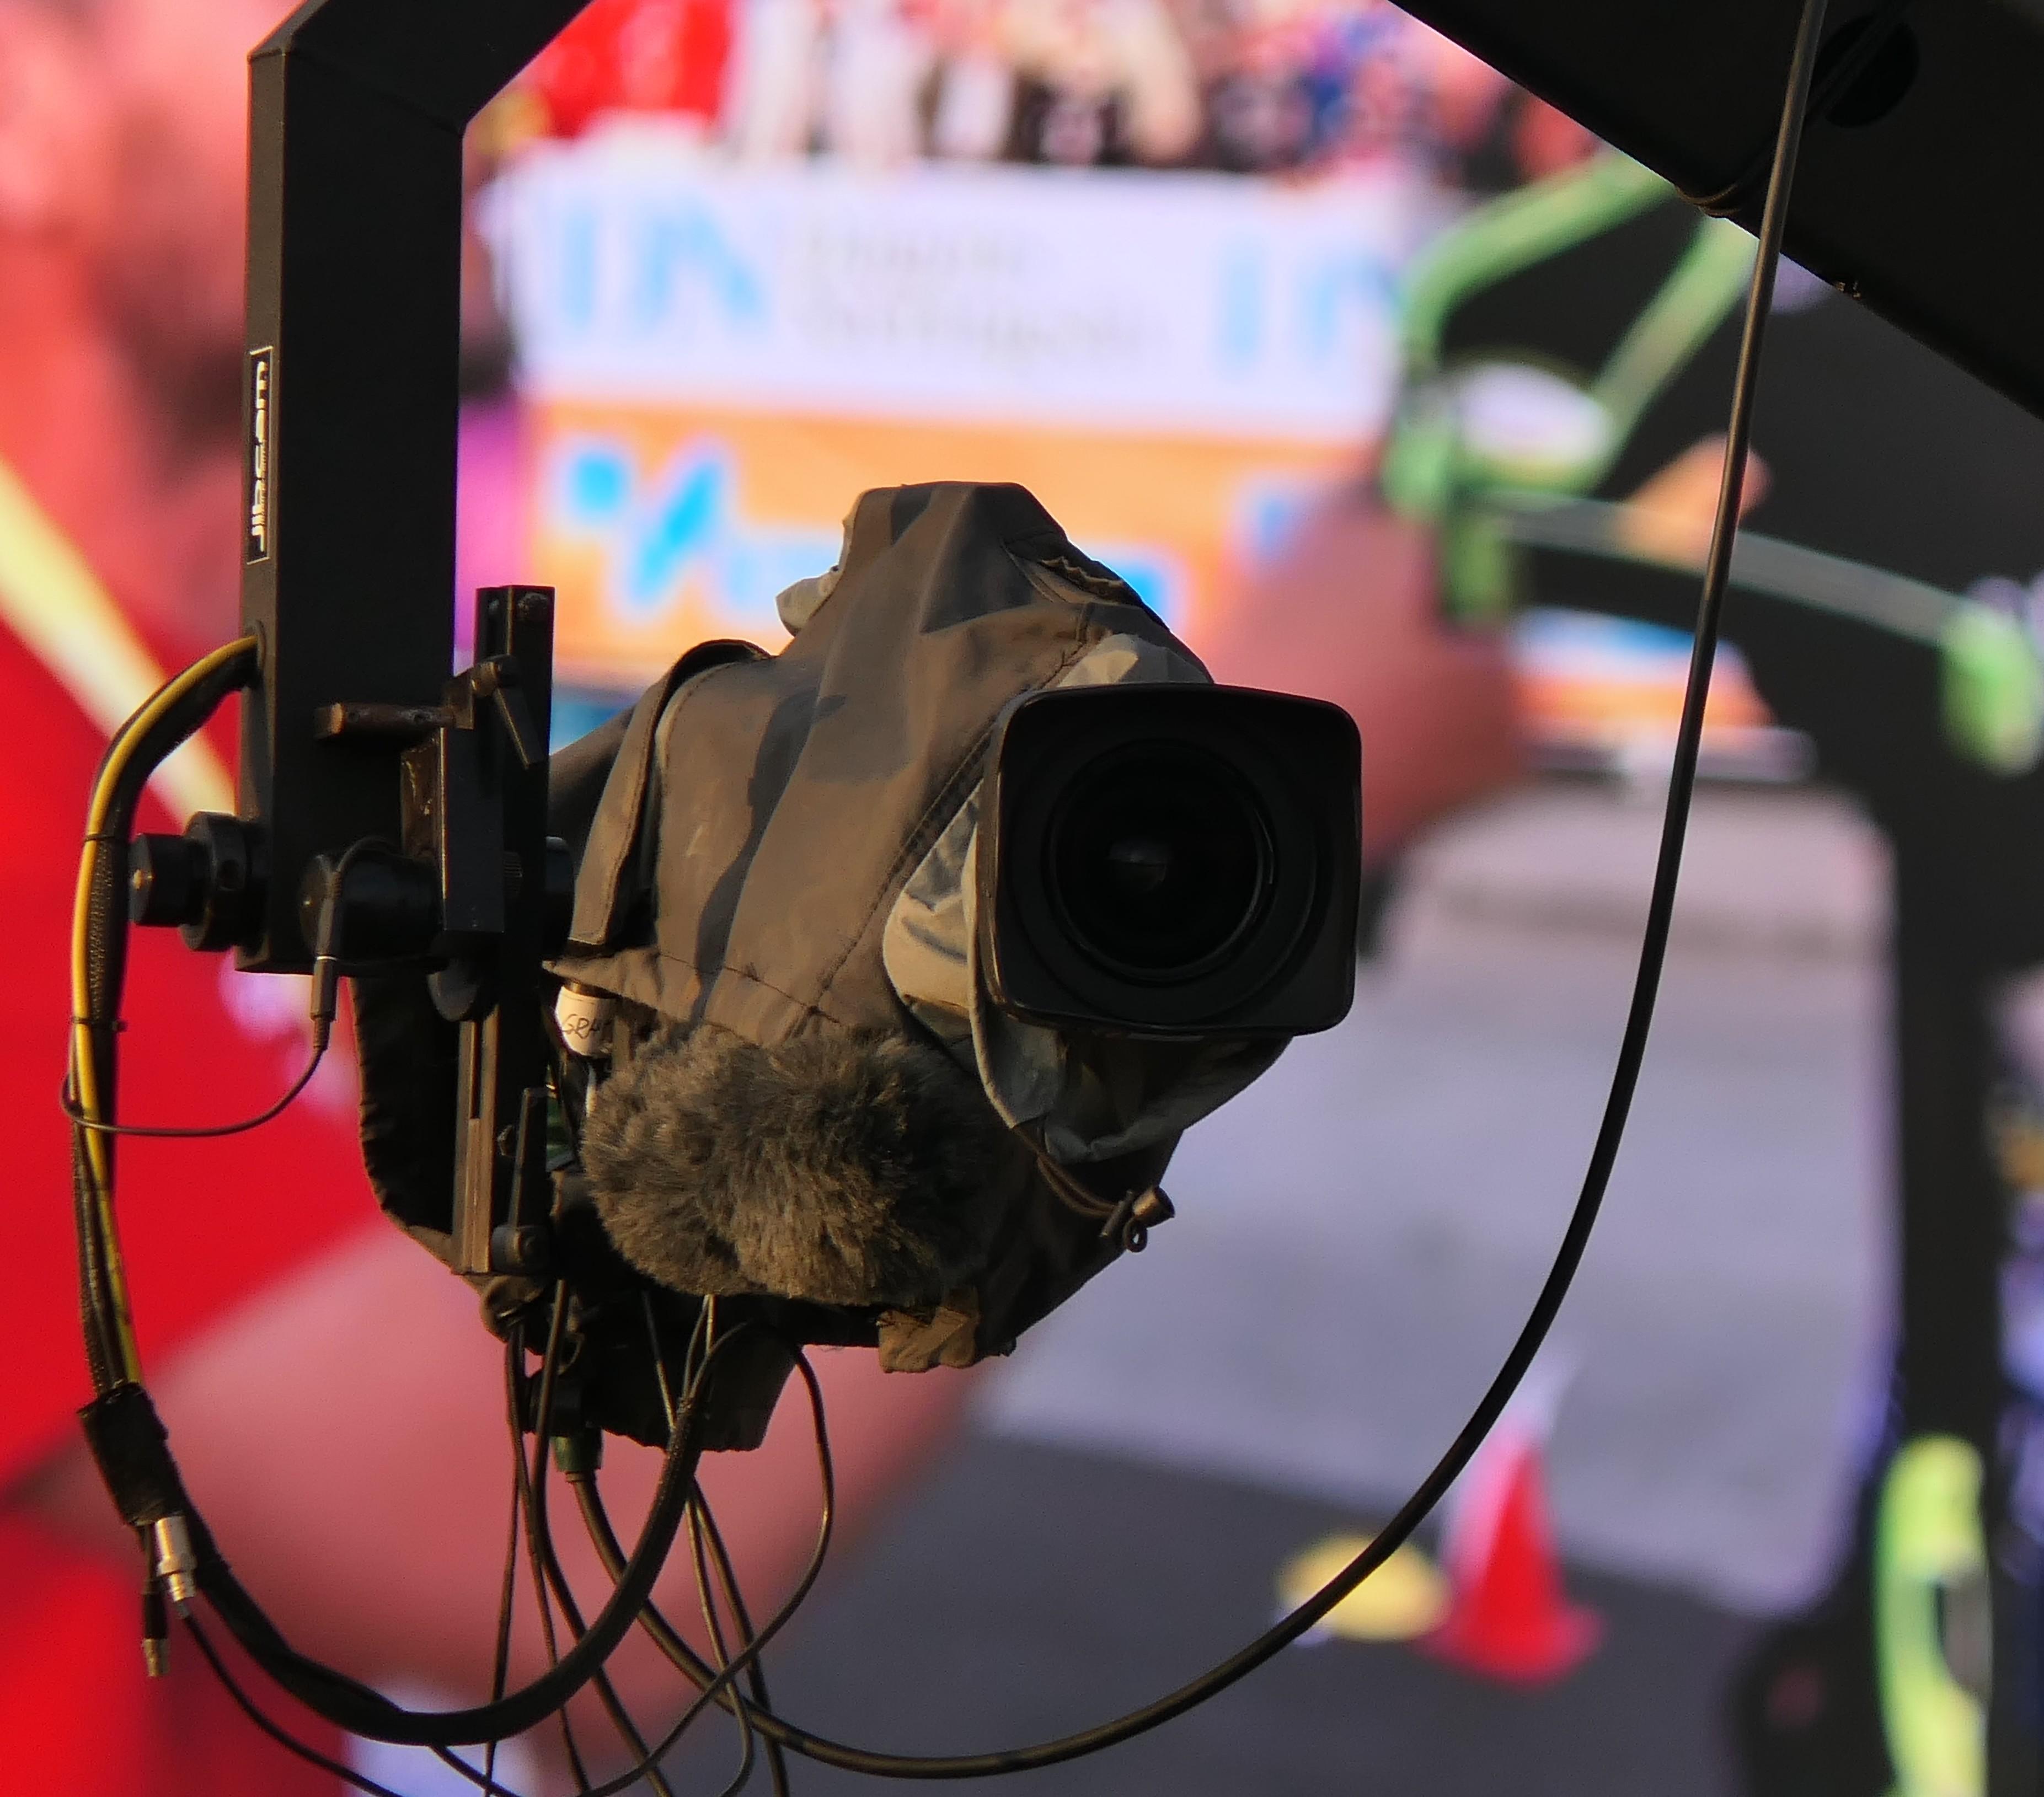 Summer Skiing Shatters TV Ratings In Norway